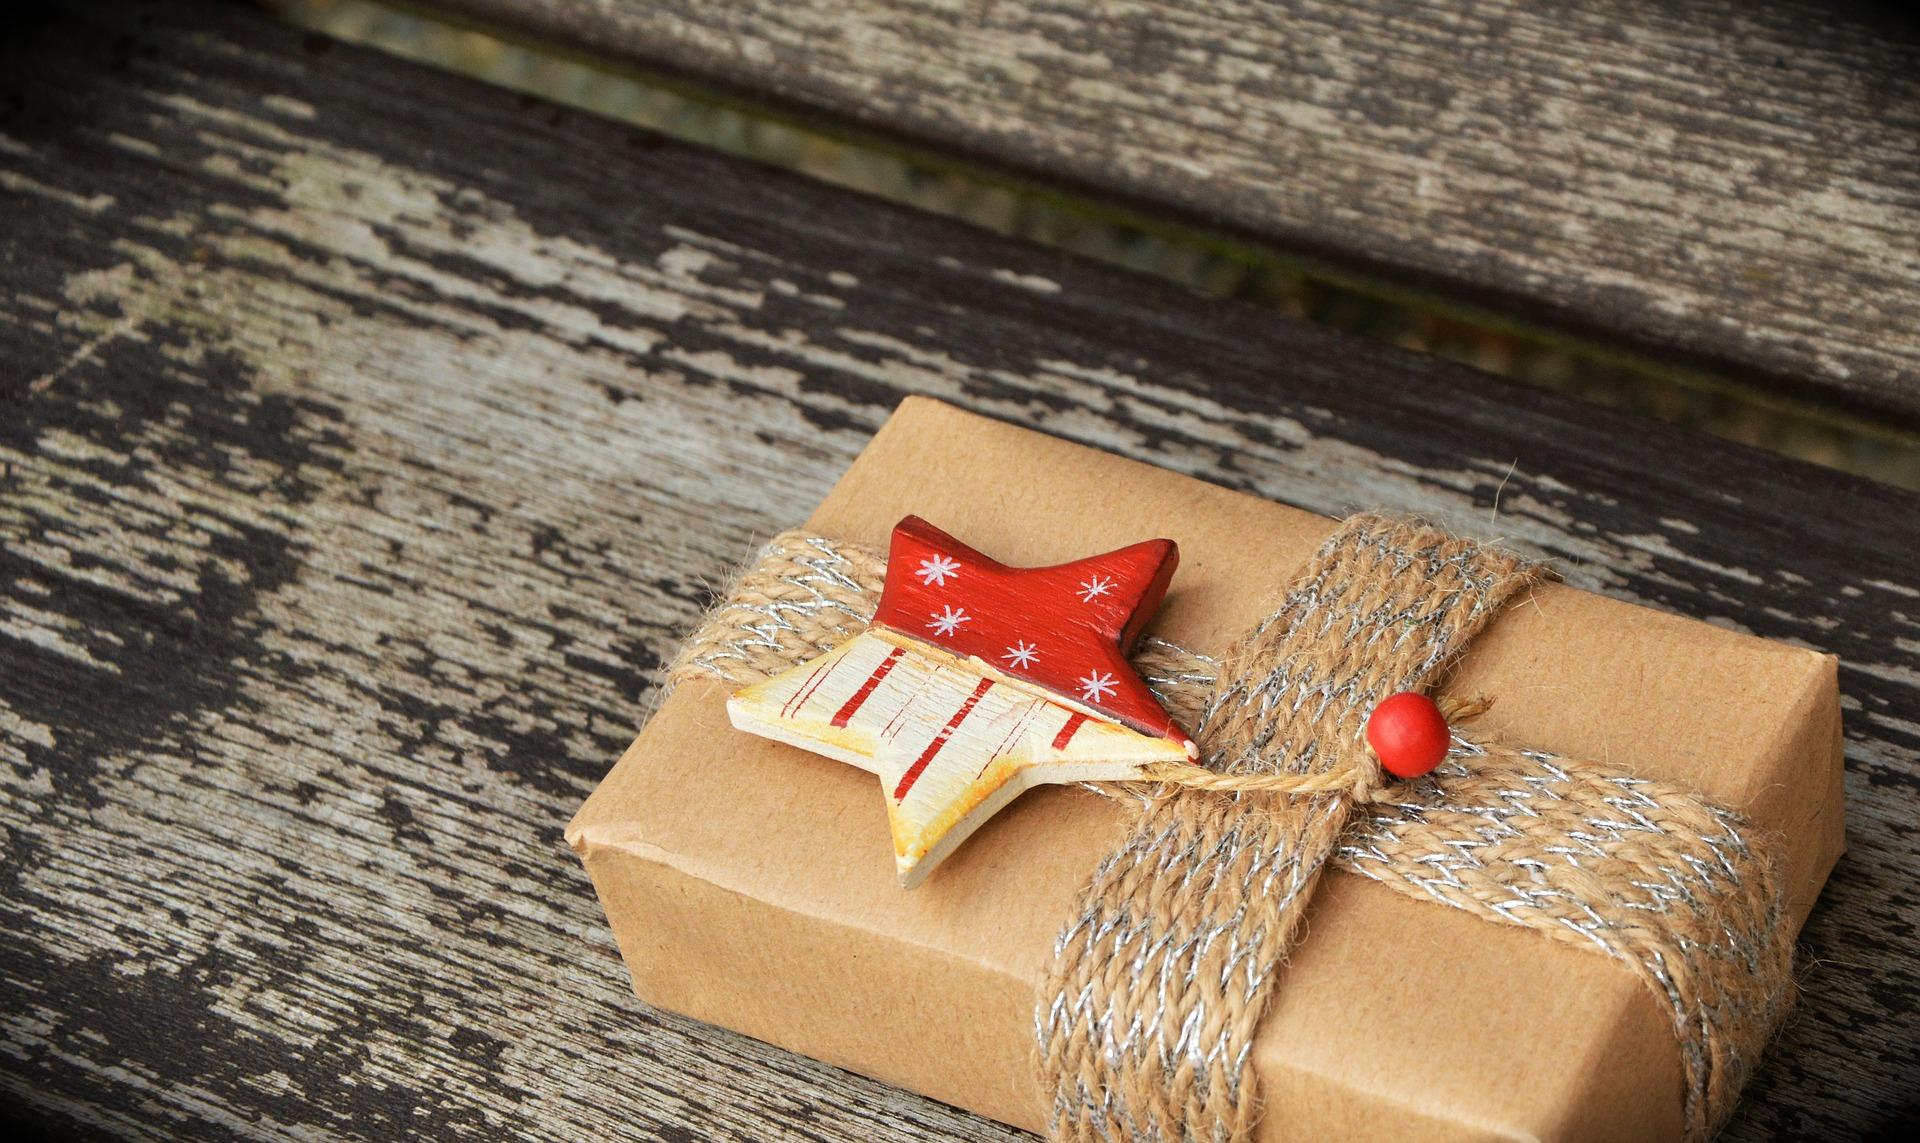 gift-1760870_1920